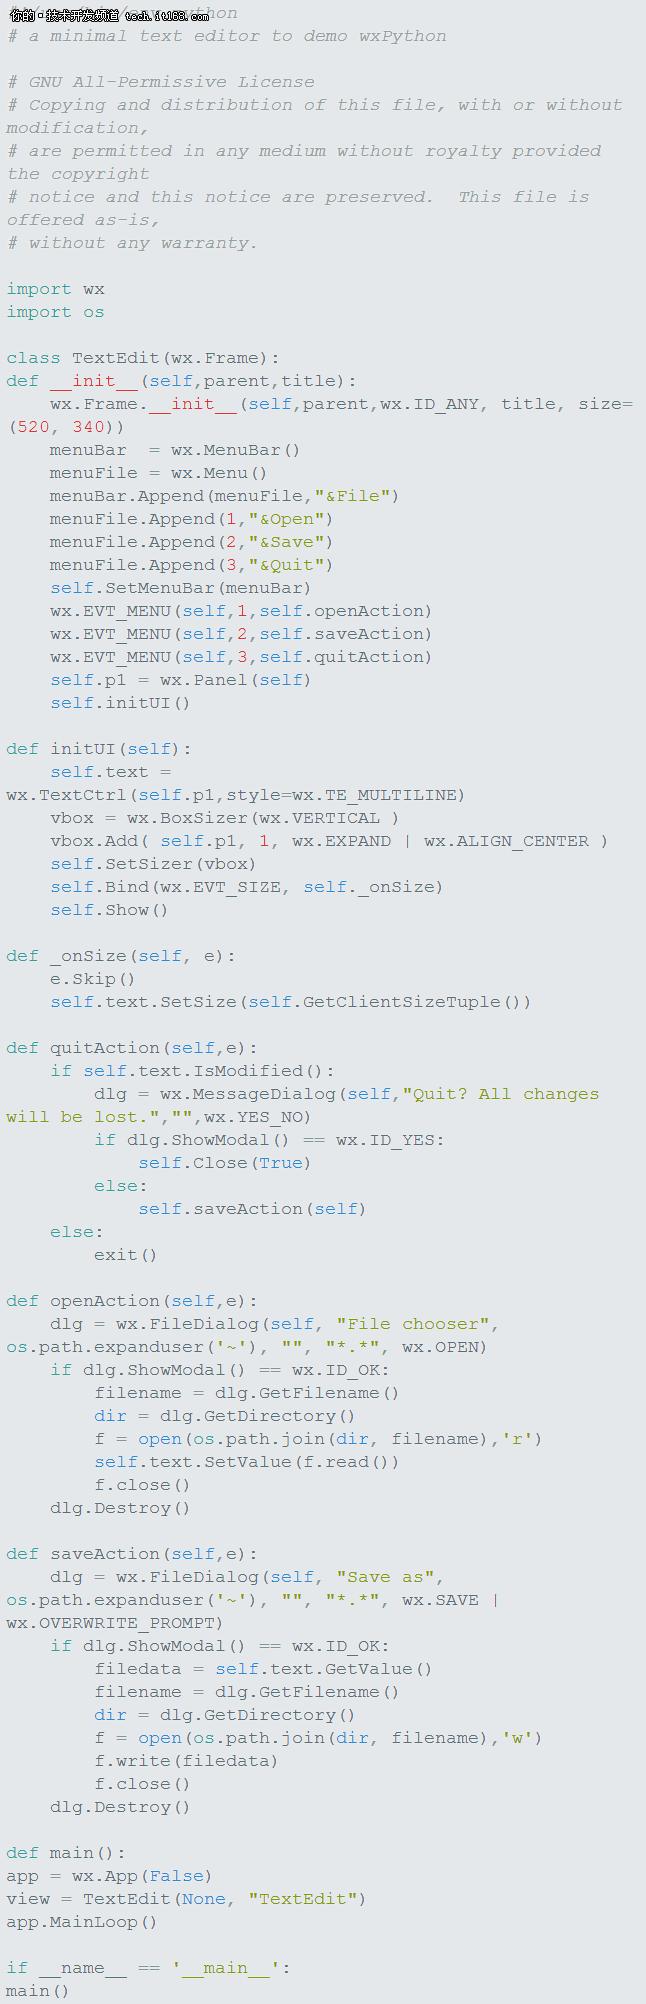 多角度对比PythonGUI库:wxPython和PyQt